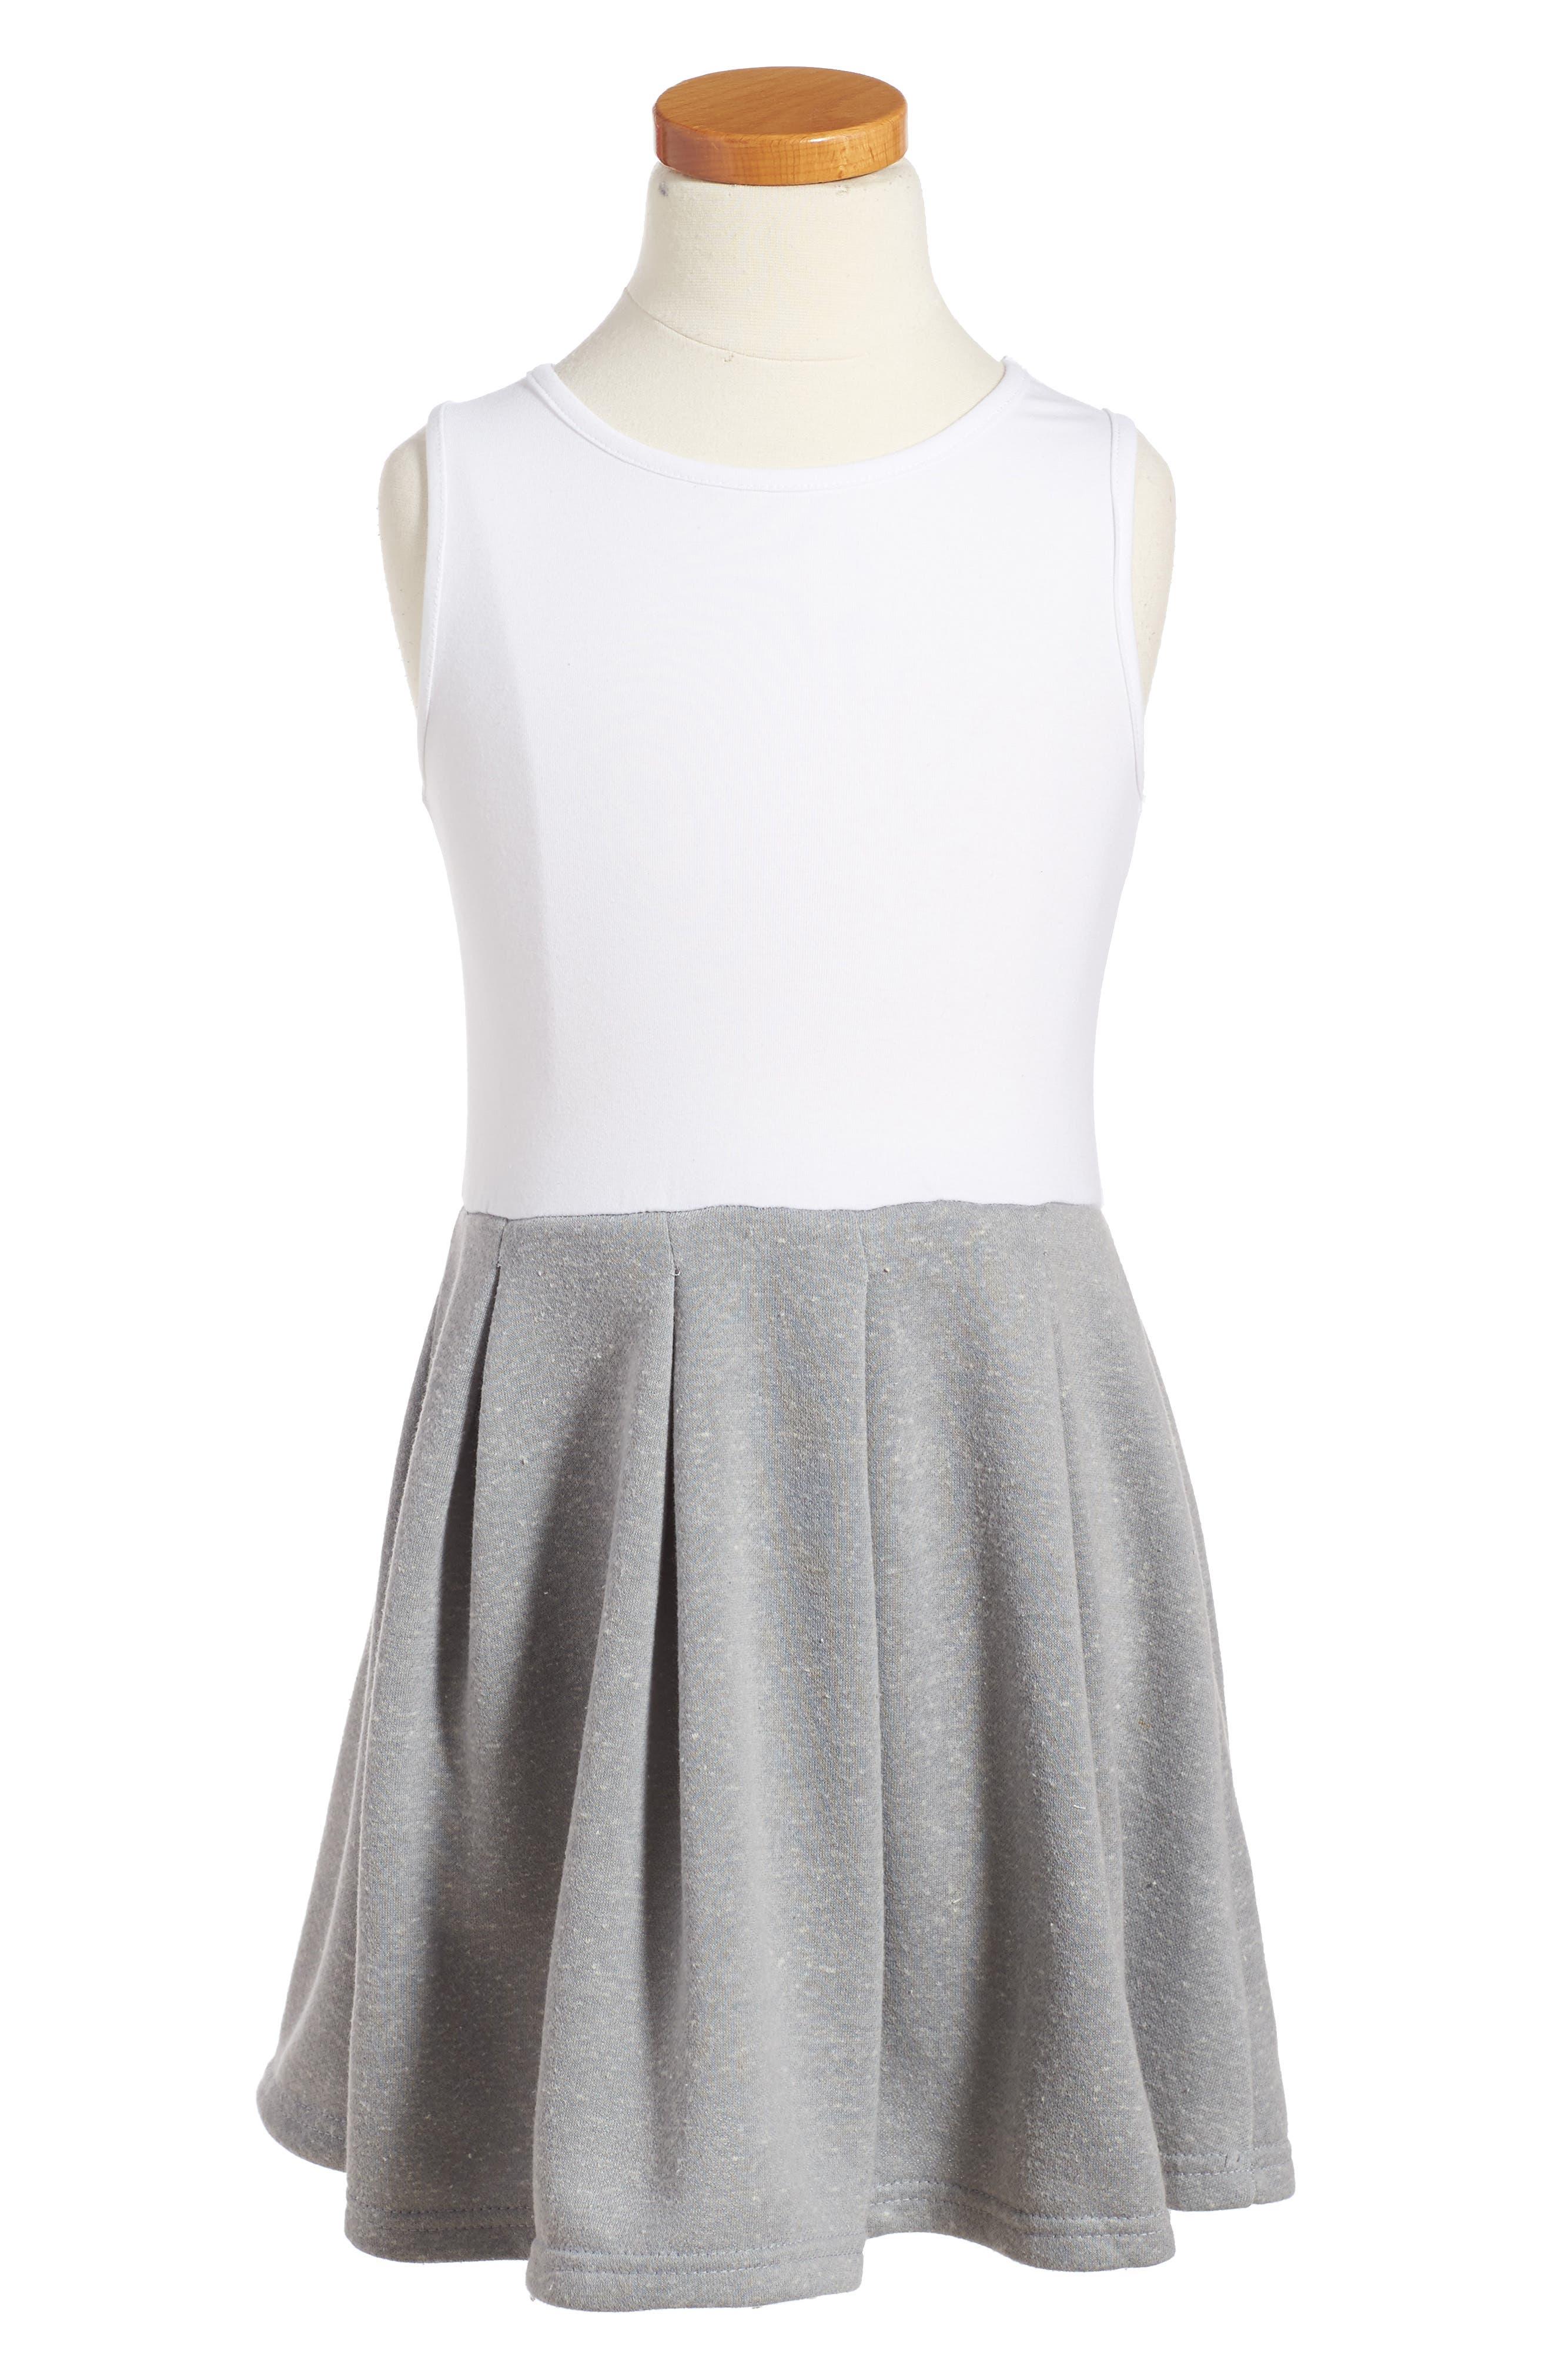 Pastourelle by Pippa and Julie Sleeveless Dress & Sweatshirt Set,                             Alternate thumbnail 2, color,                             Grey